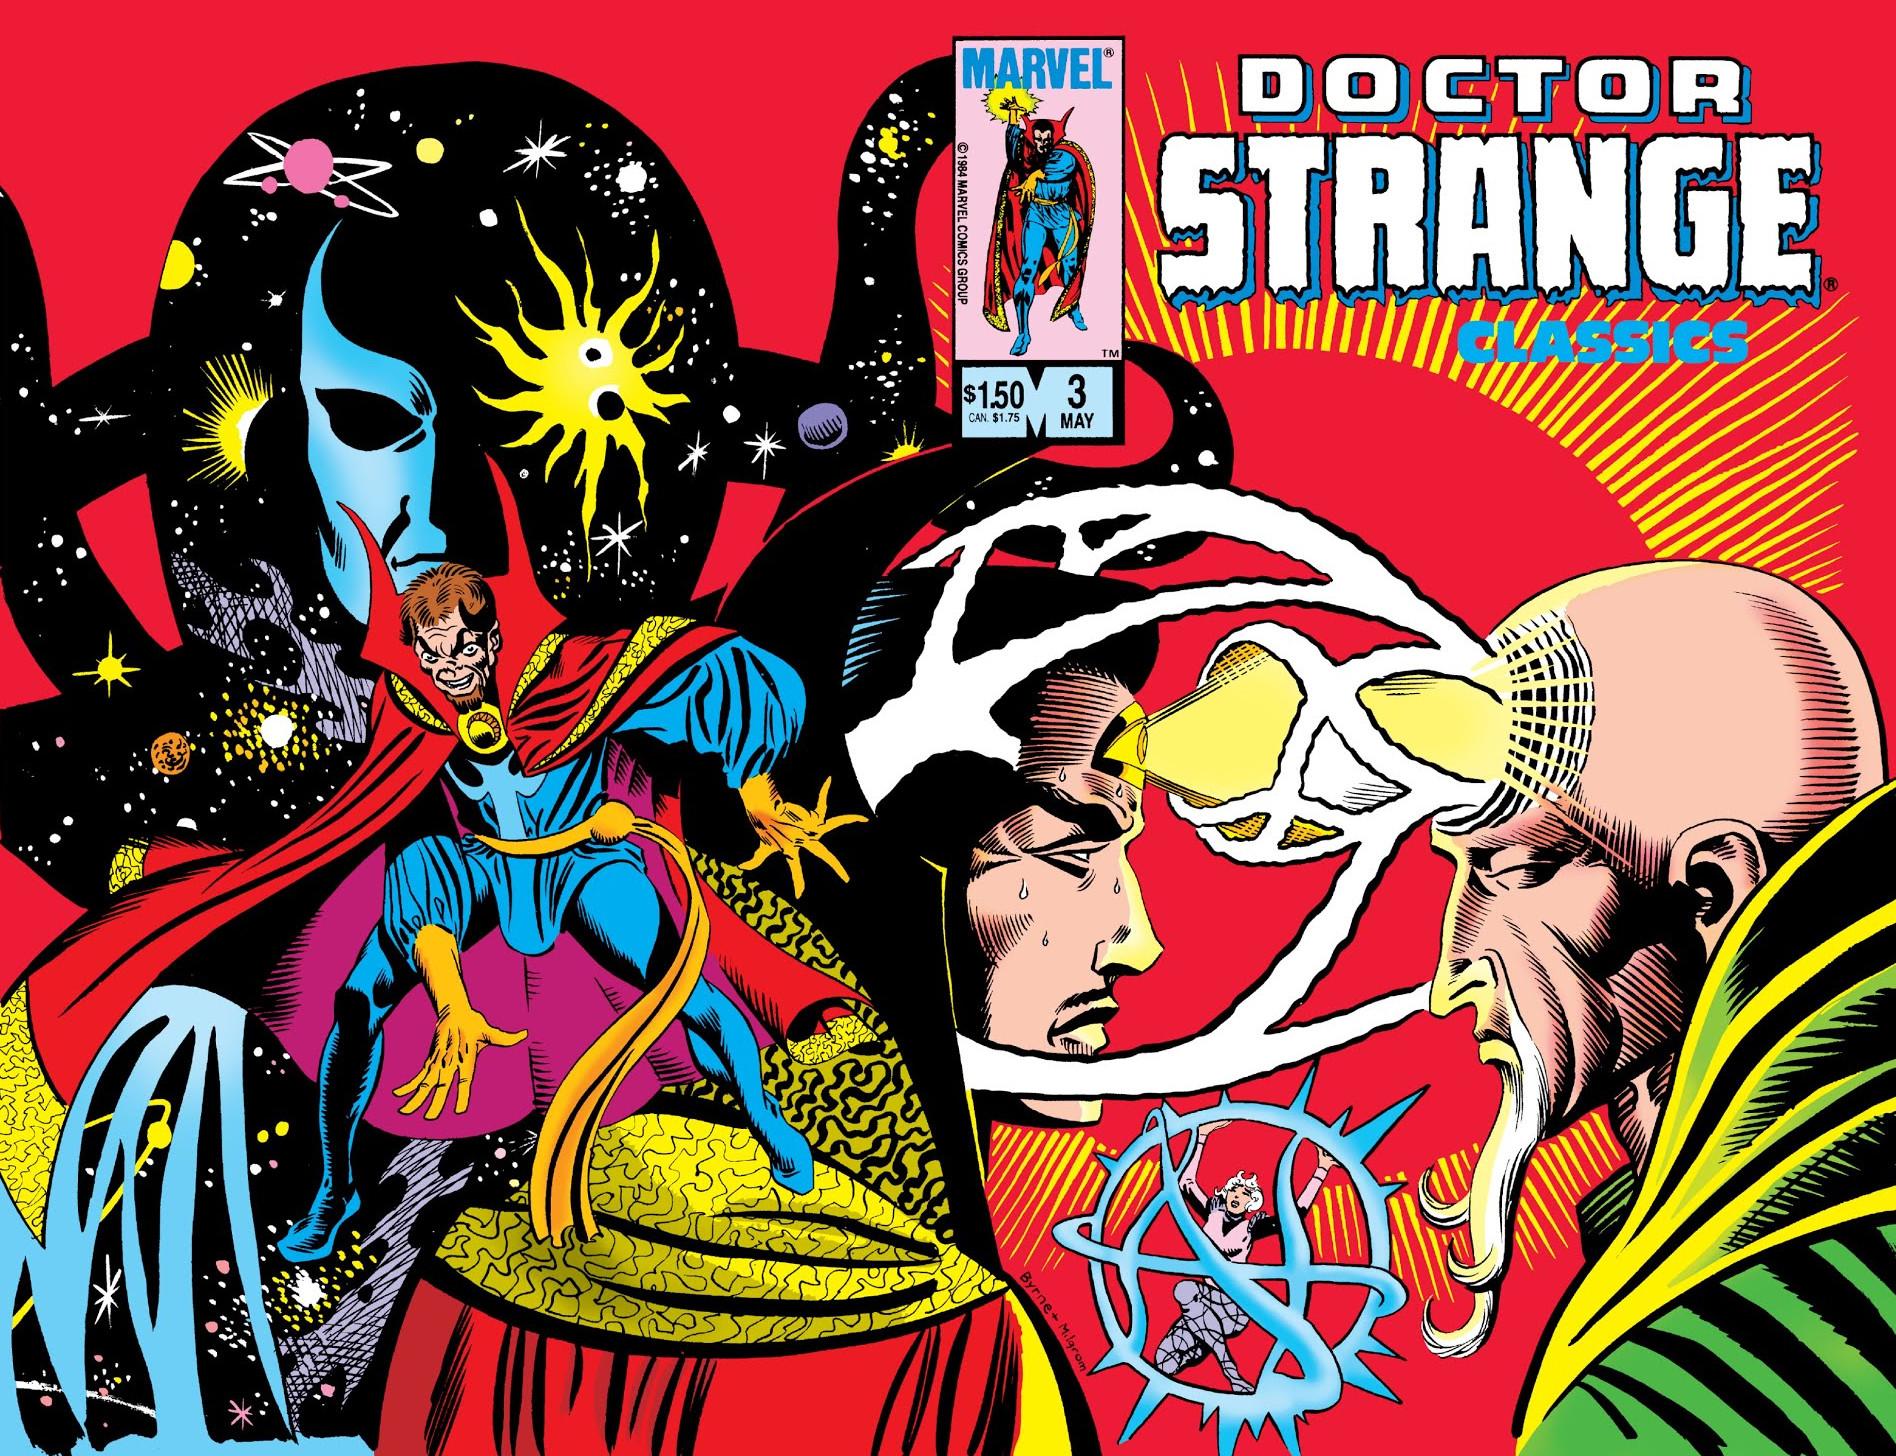 Jelek a Marvel filmekben Doctor_Strange_Classics_Vol_1_3_Wraparound